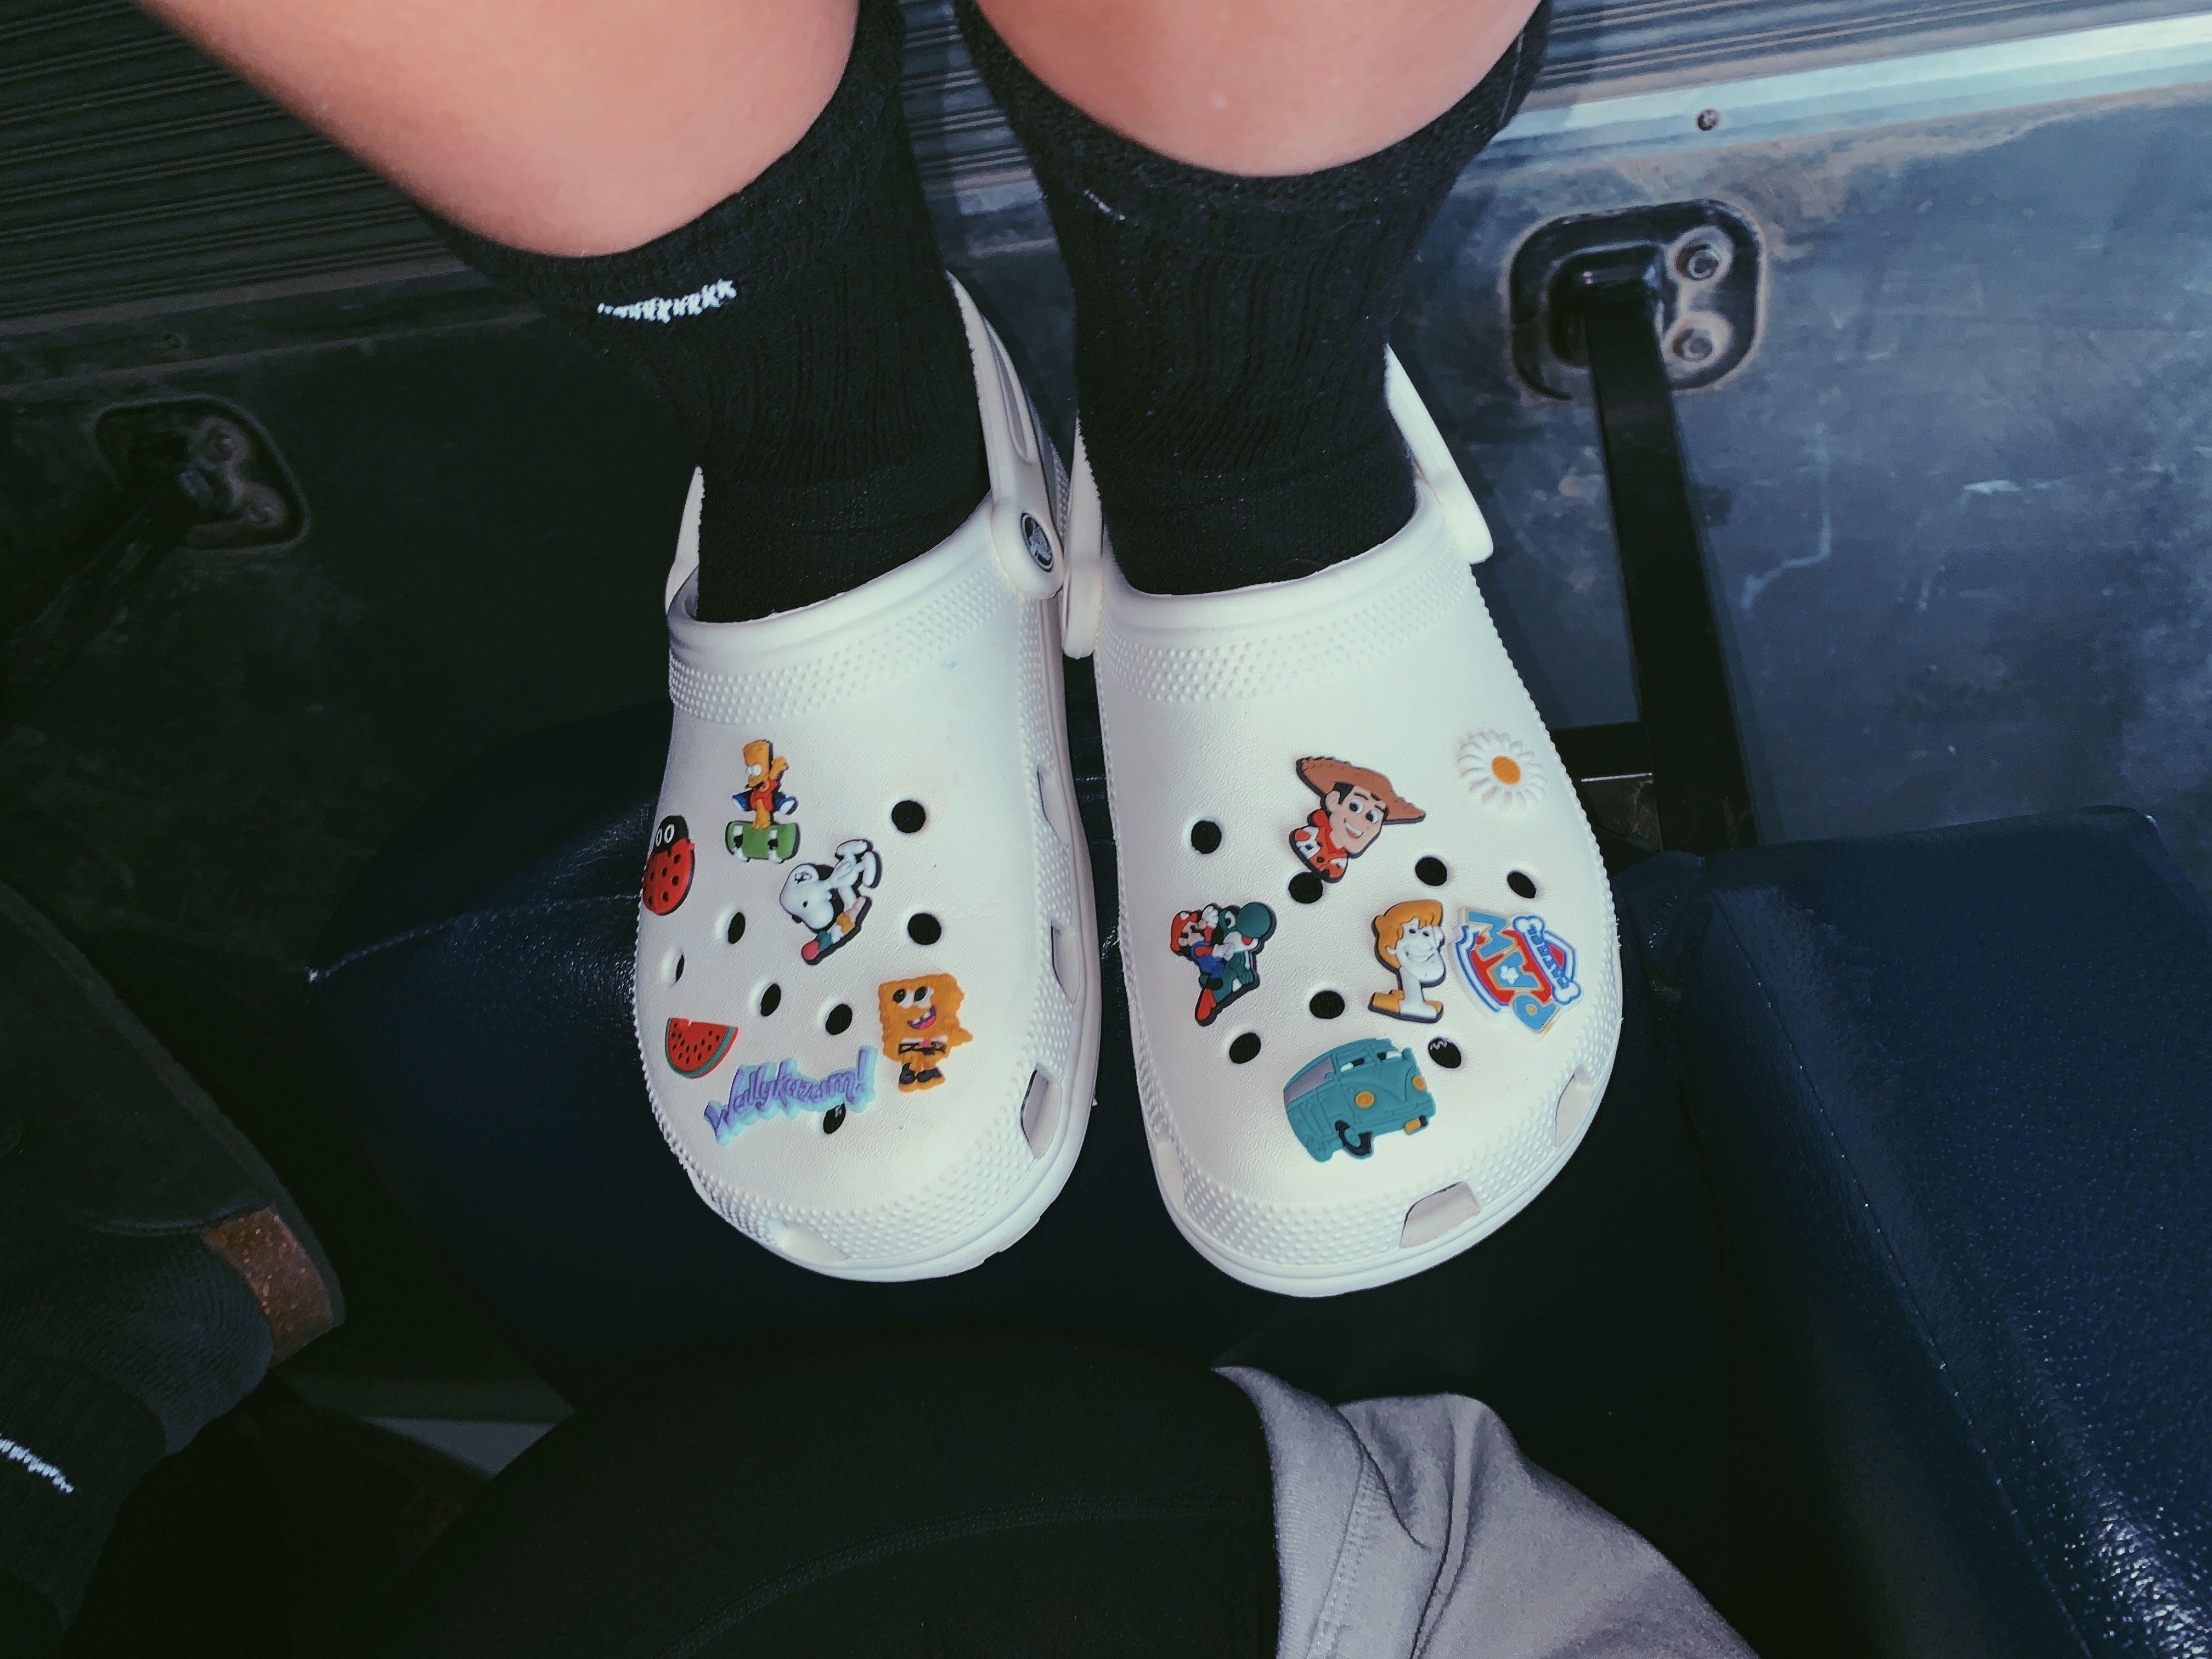 Crocs image by Kam | Crocs shoes